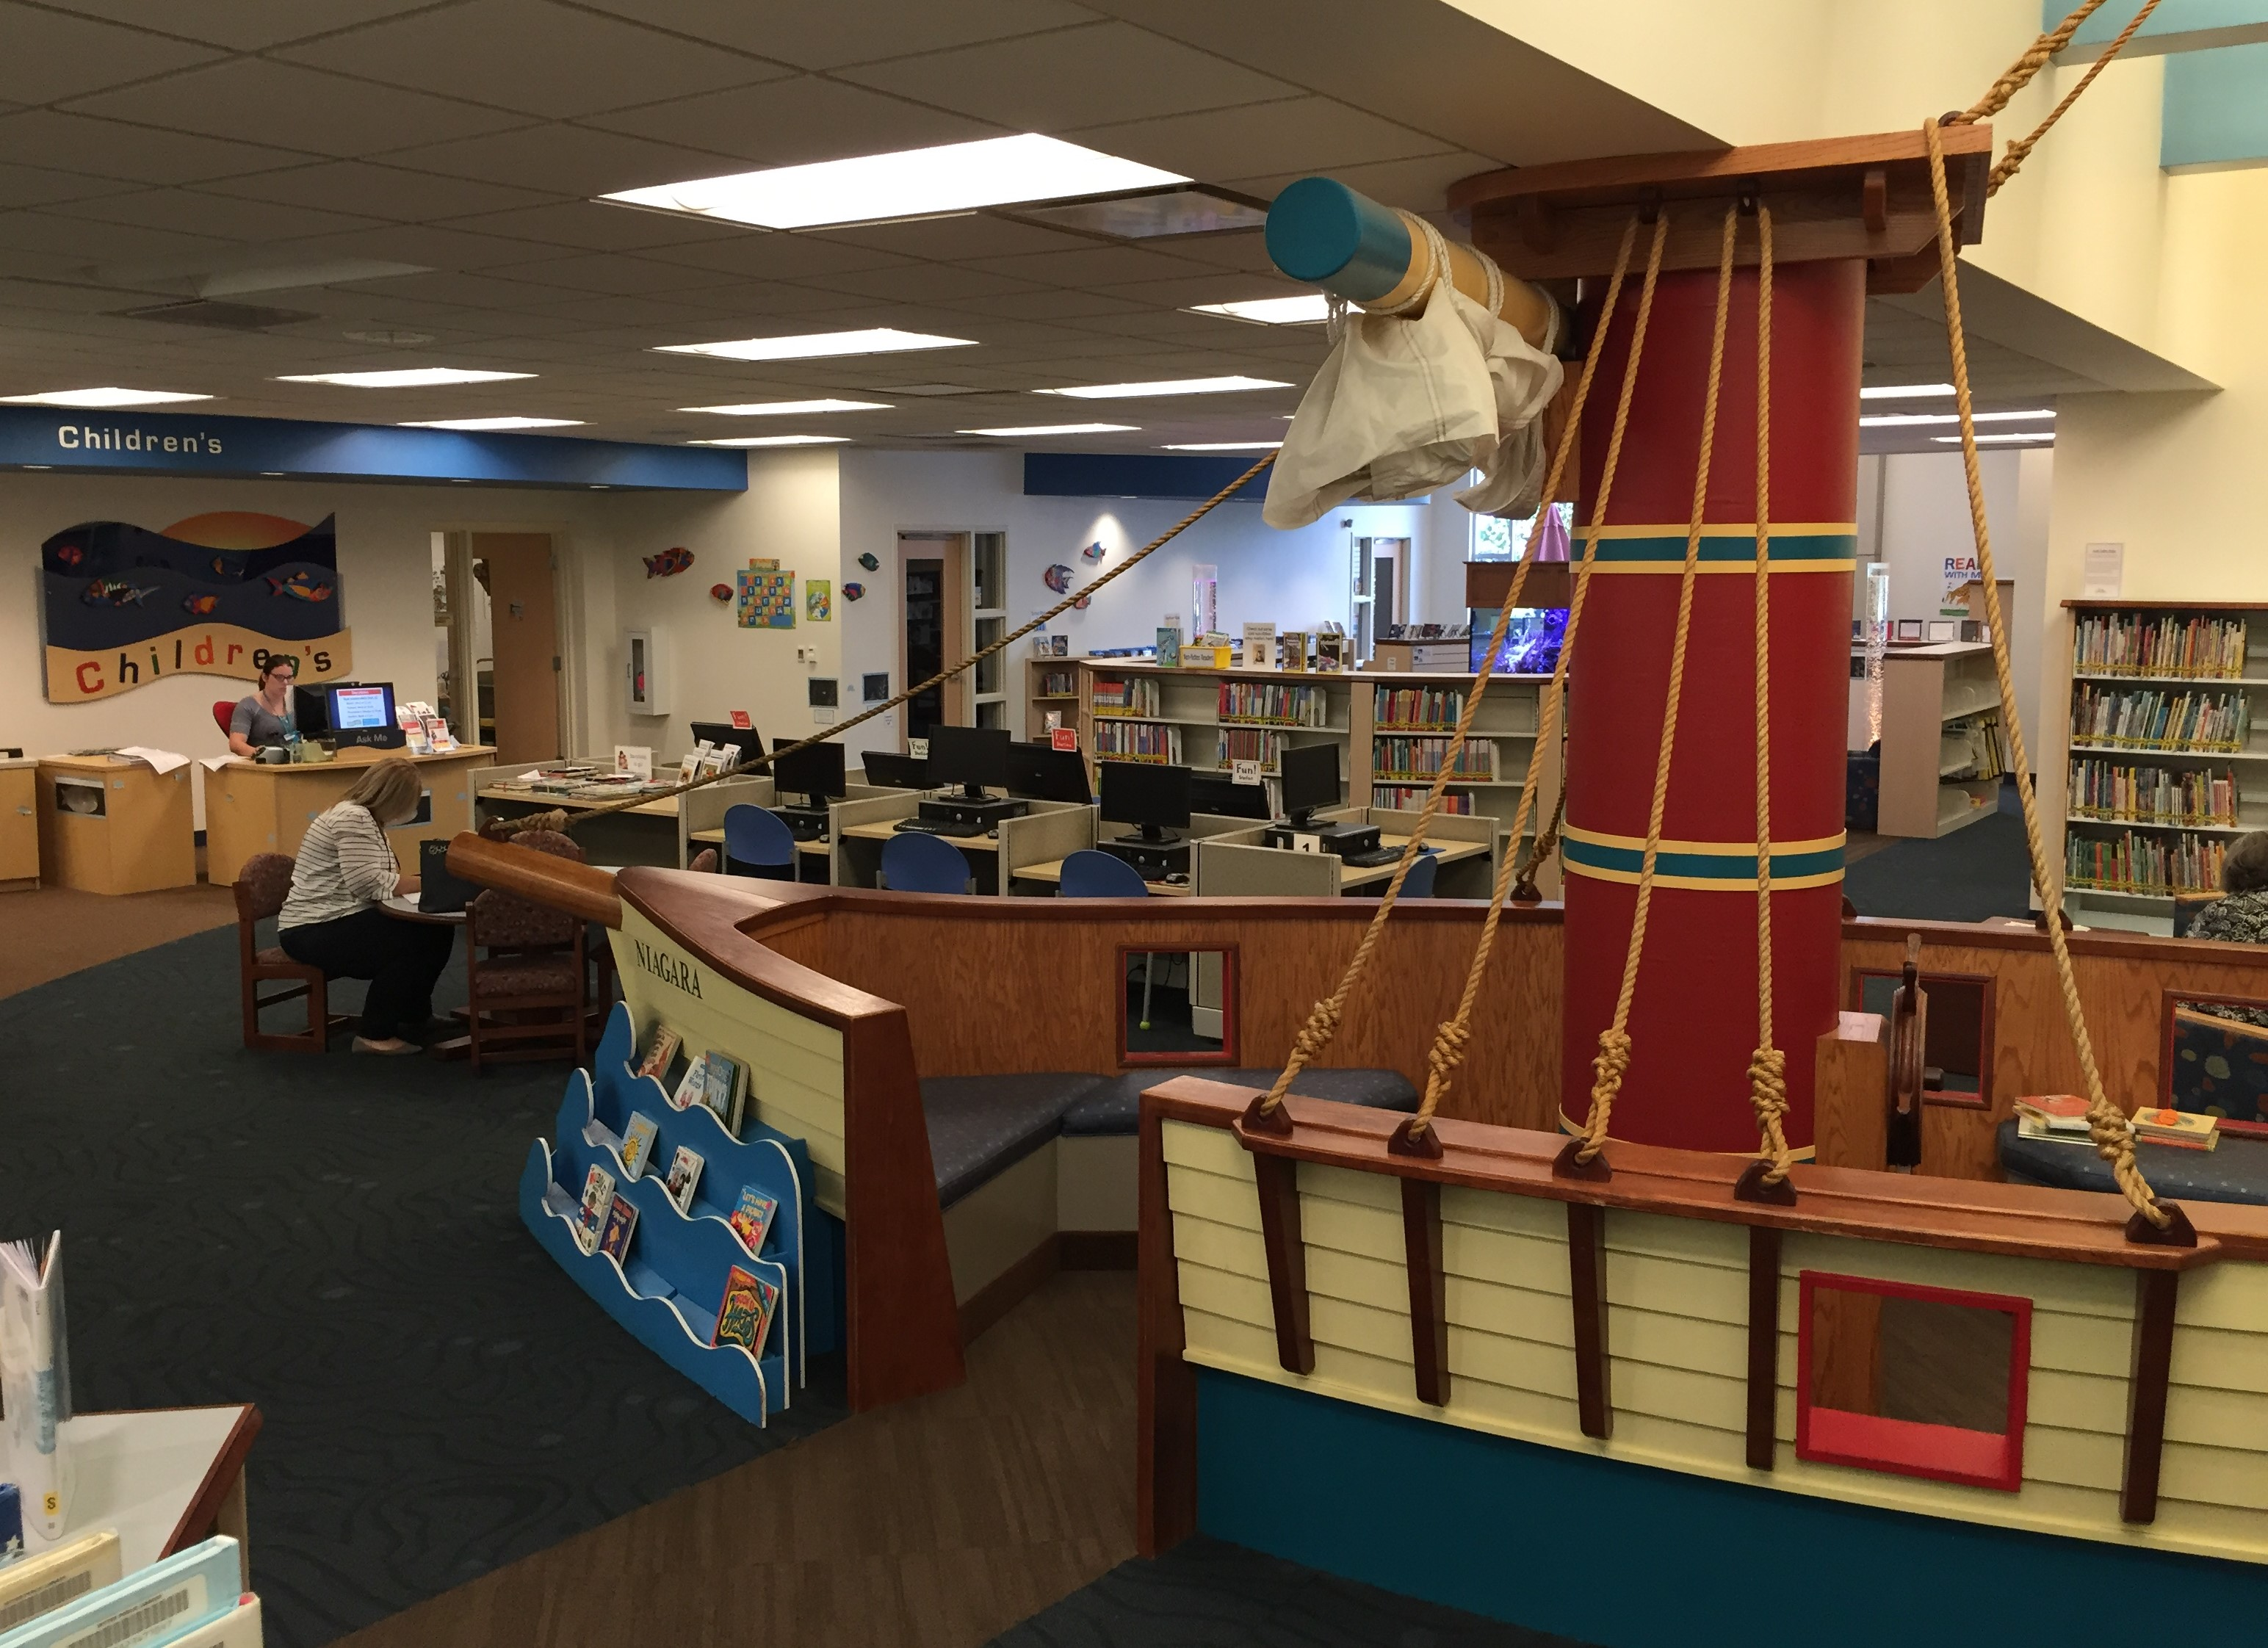 Ritter Public Library, Vermilion, Ohio (Photo: Sarah Sundin, August 2016)